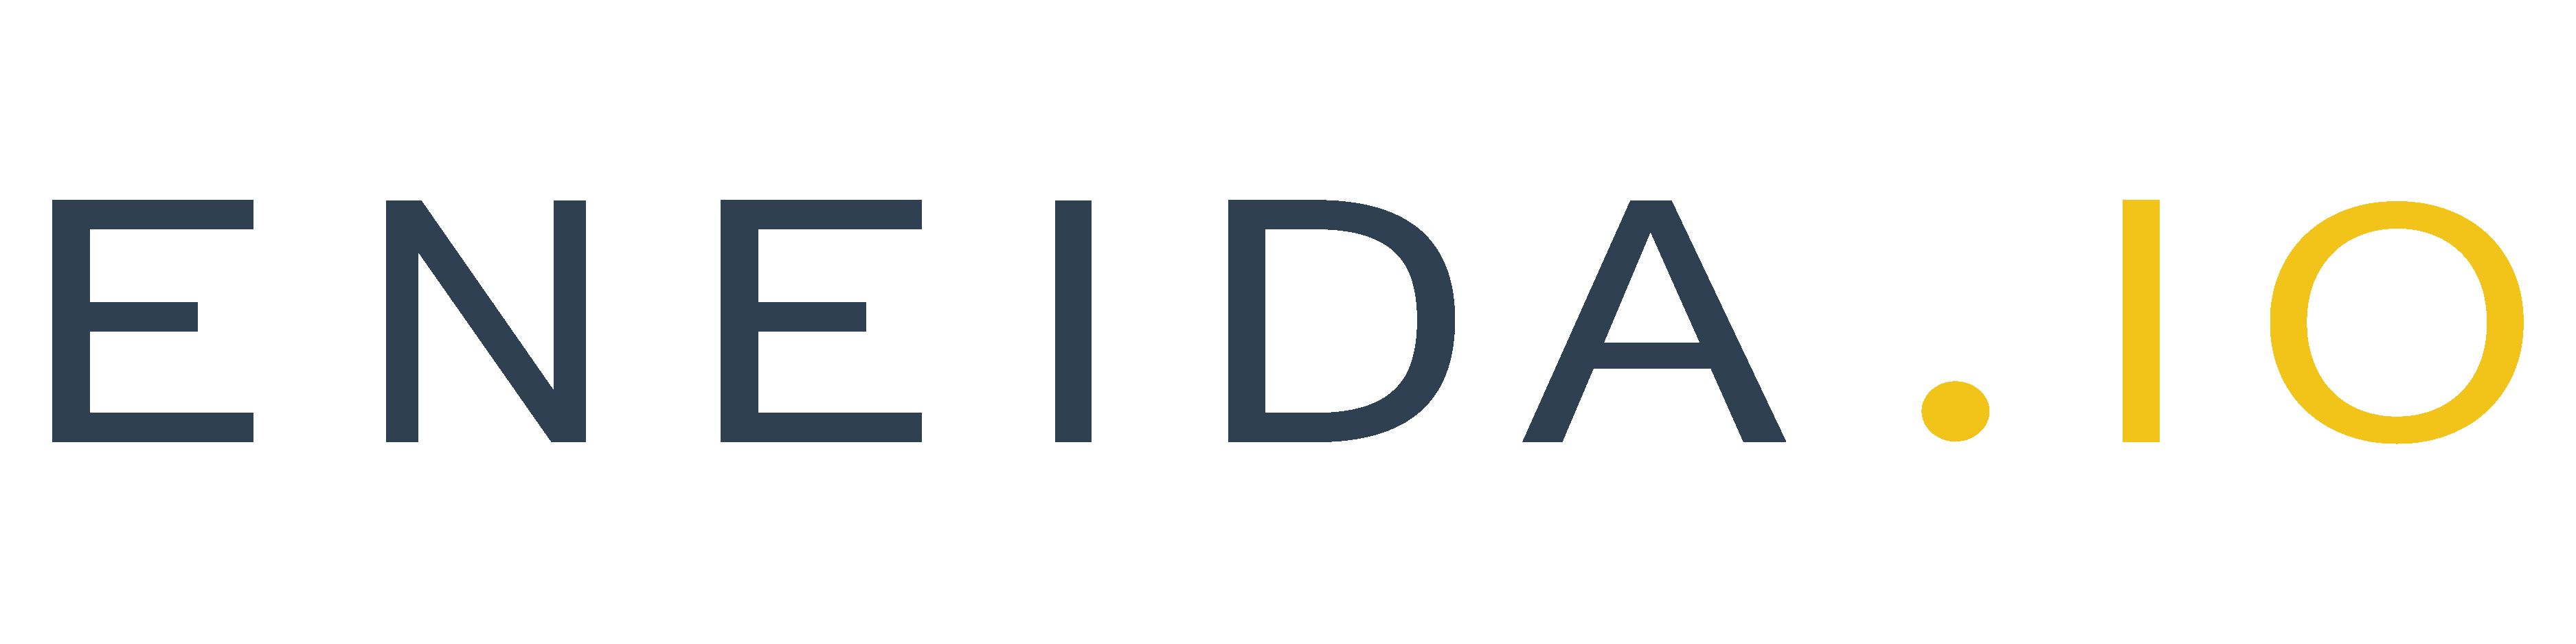 Logotipo grd 03